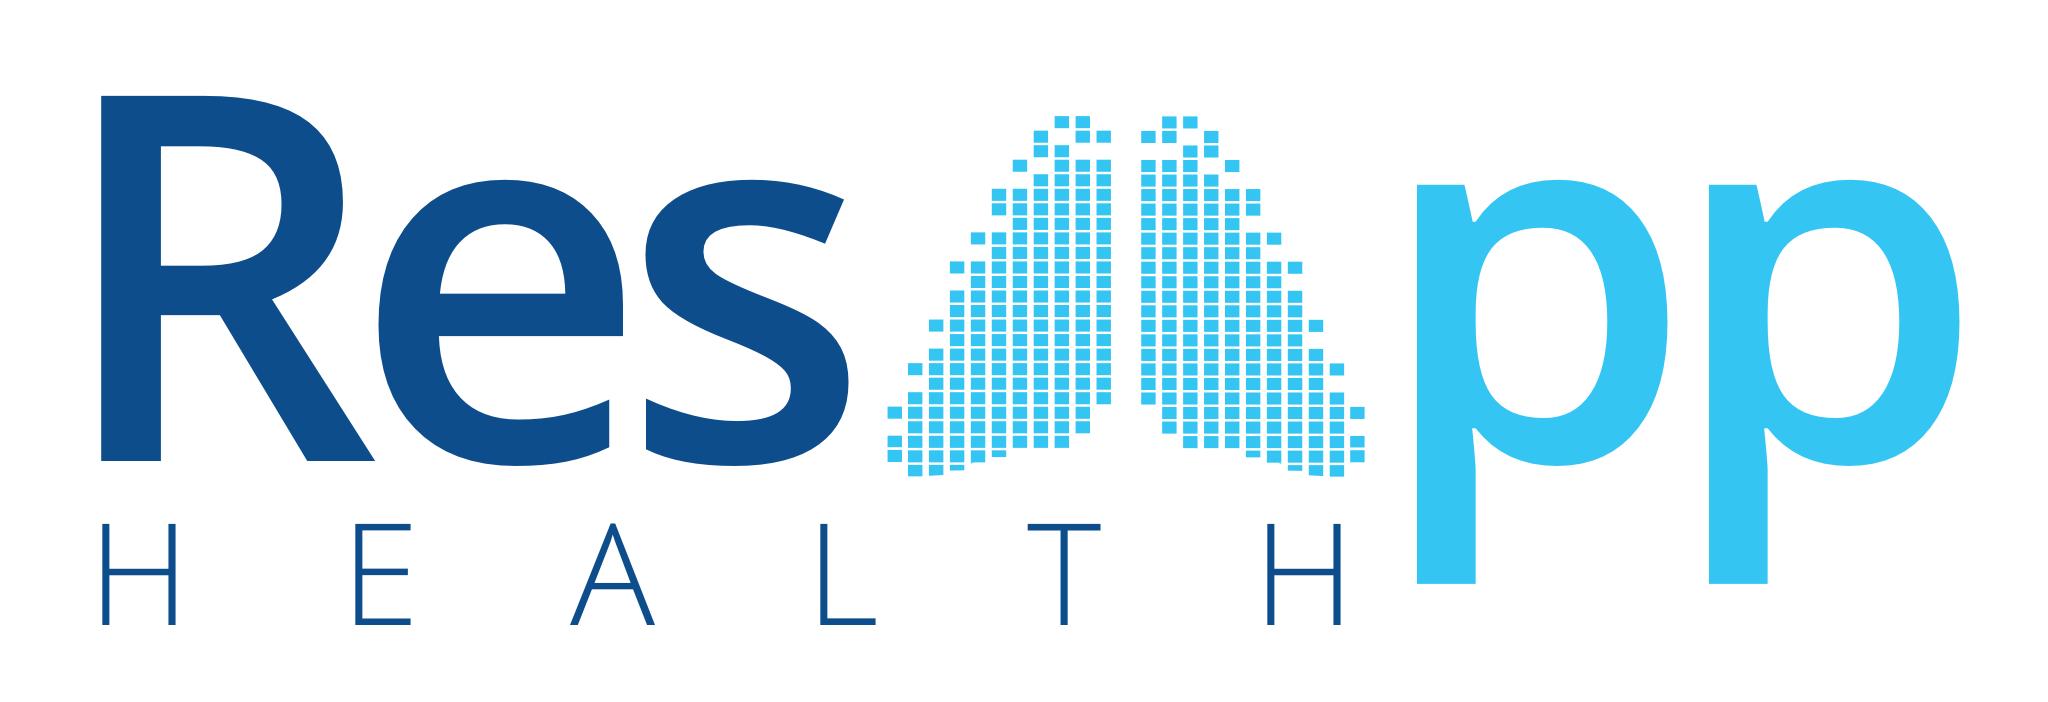 ResApp-Logo-2048px